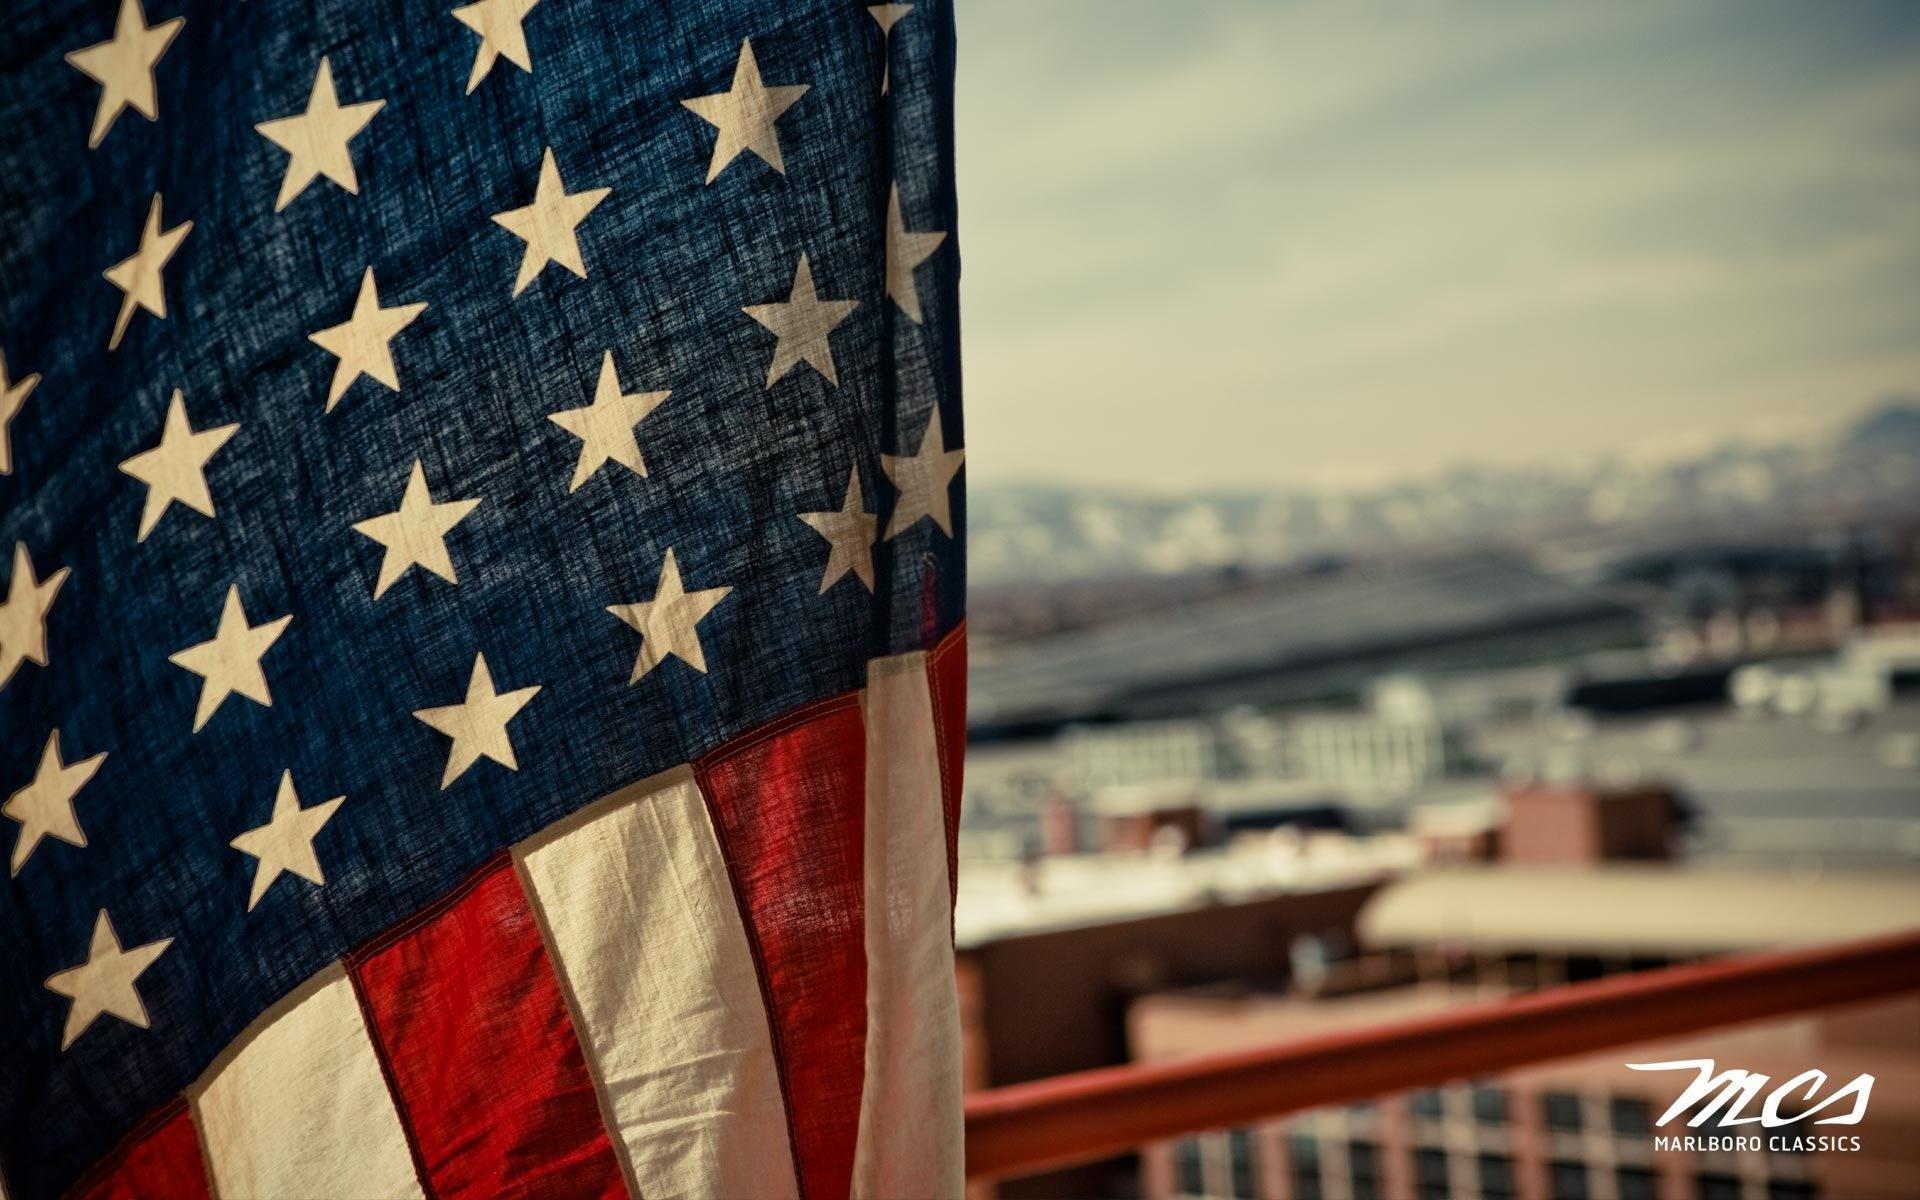 USA wallpaper 1920x1200 45568 1920x1200